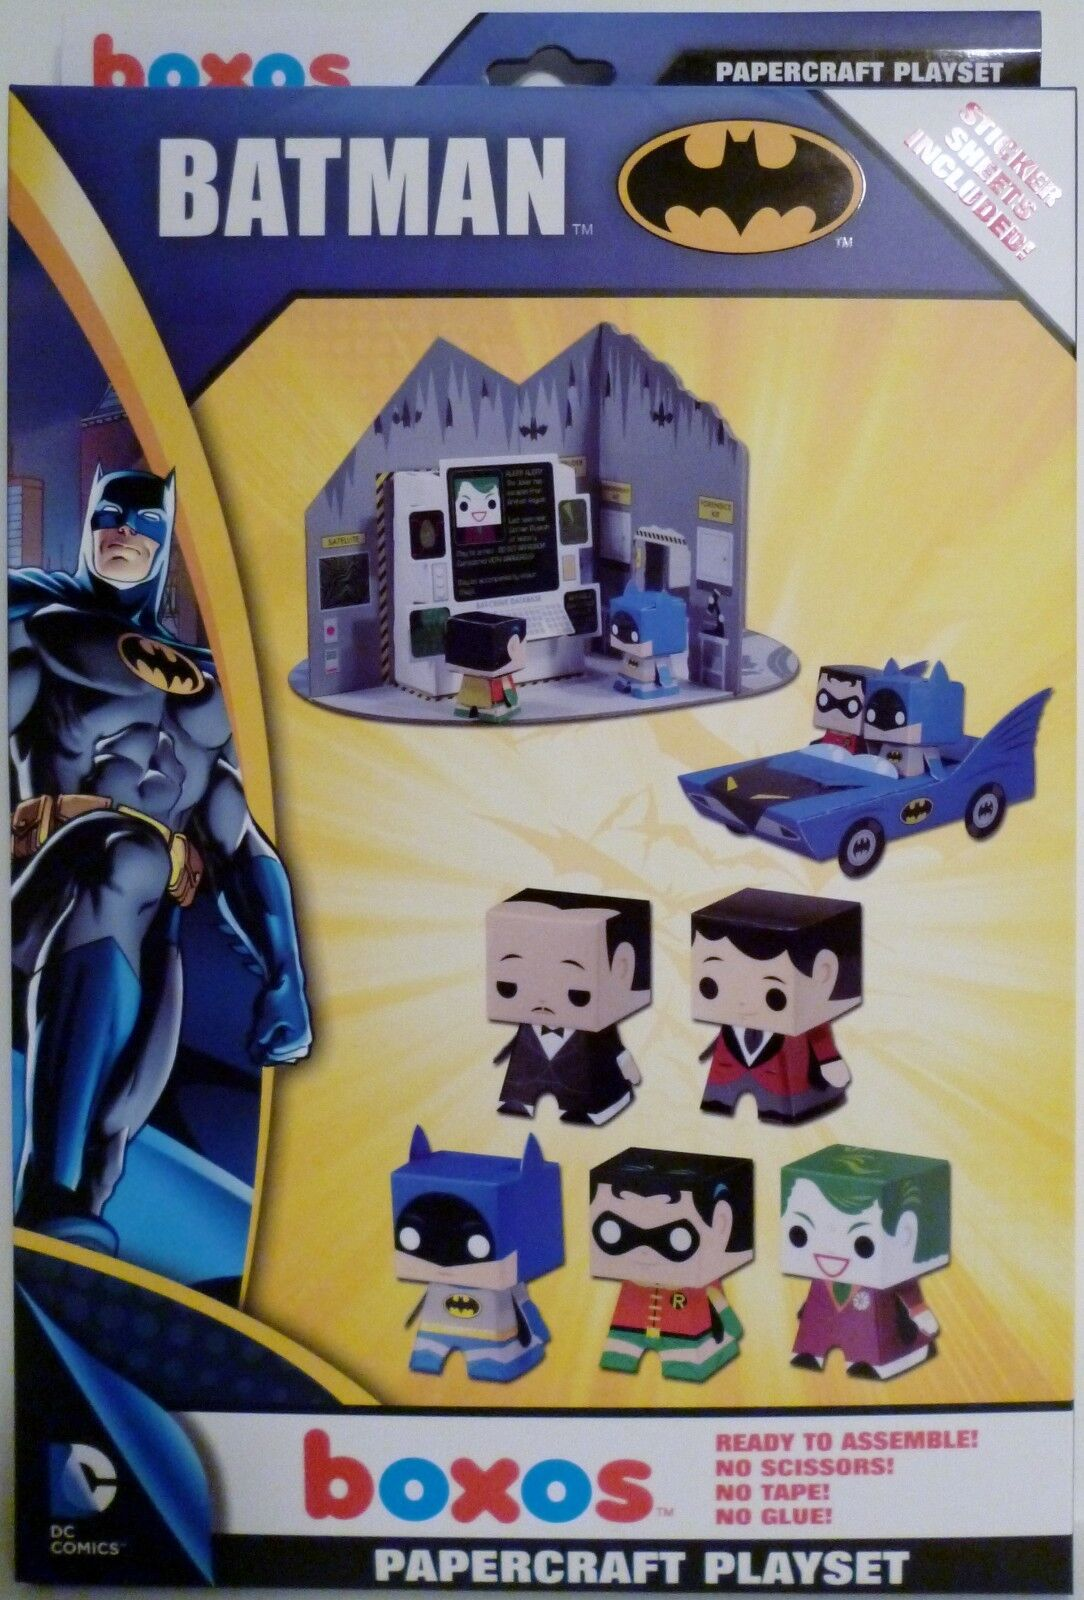 Funko BOXOS Batman papercraft playset Batmobile BATMAN Joker /& more Shop Zwaag